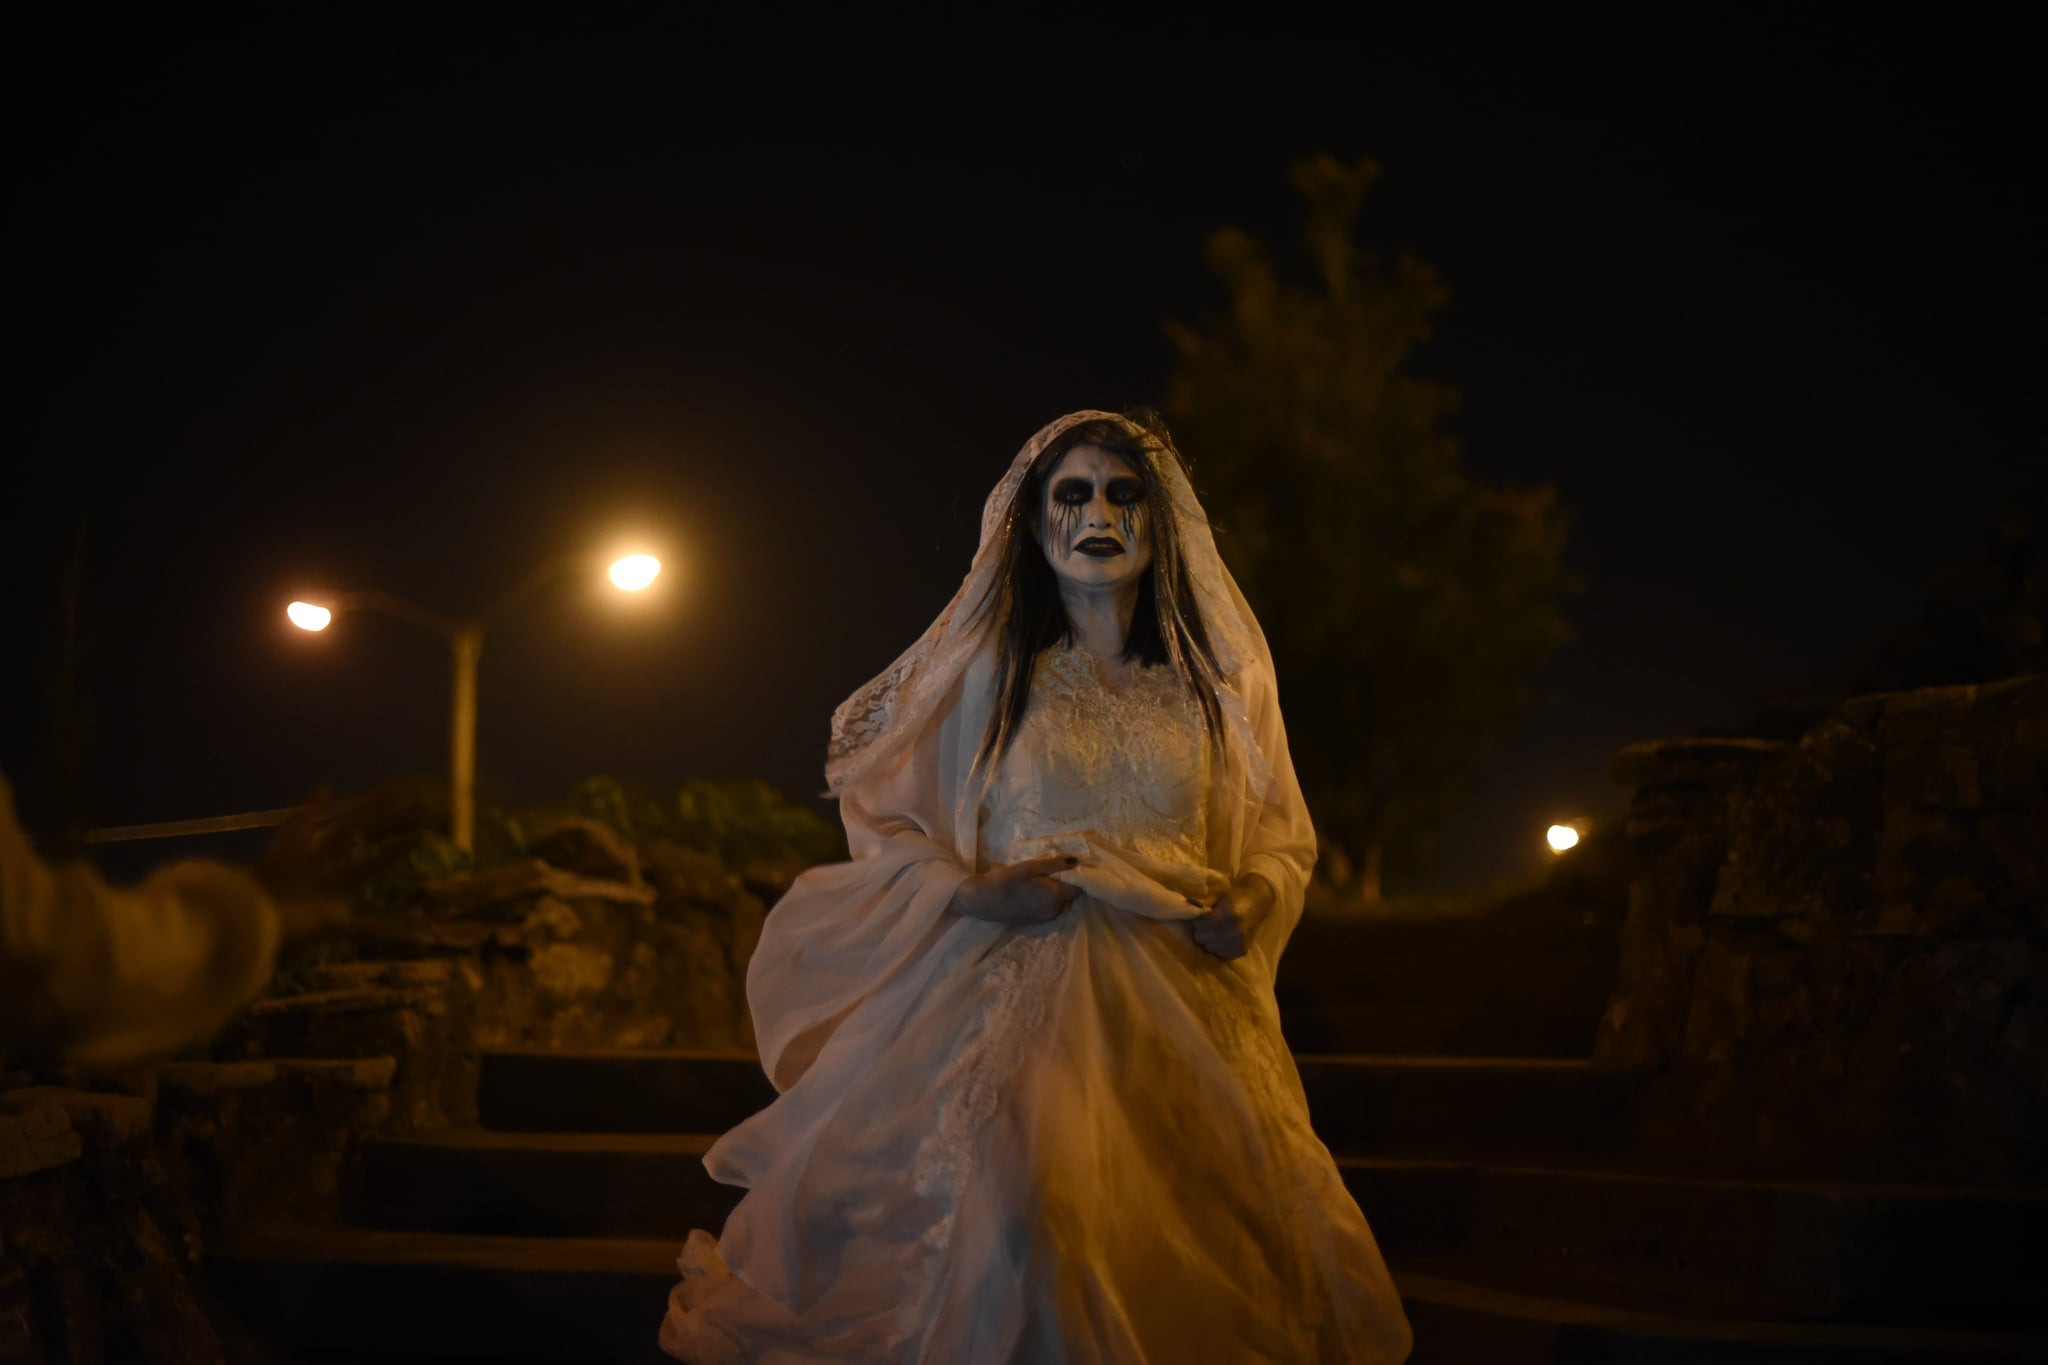 Marisol Ramirez as the unveiled La Llorona in  The Curse of La Llorona.